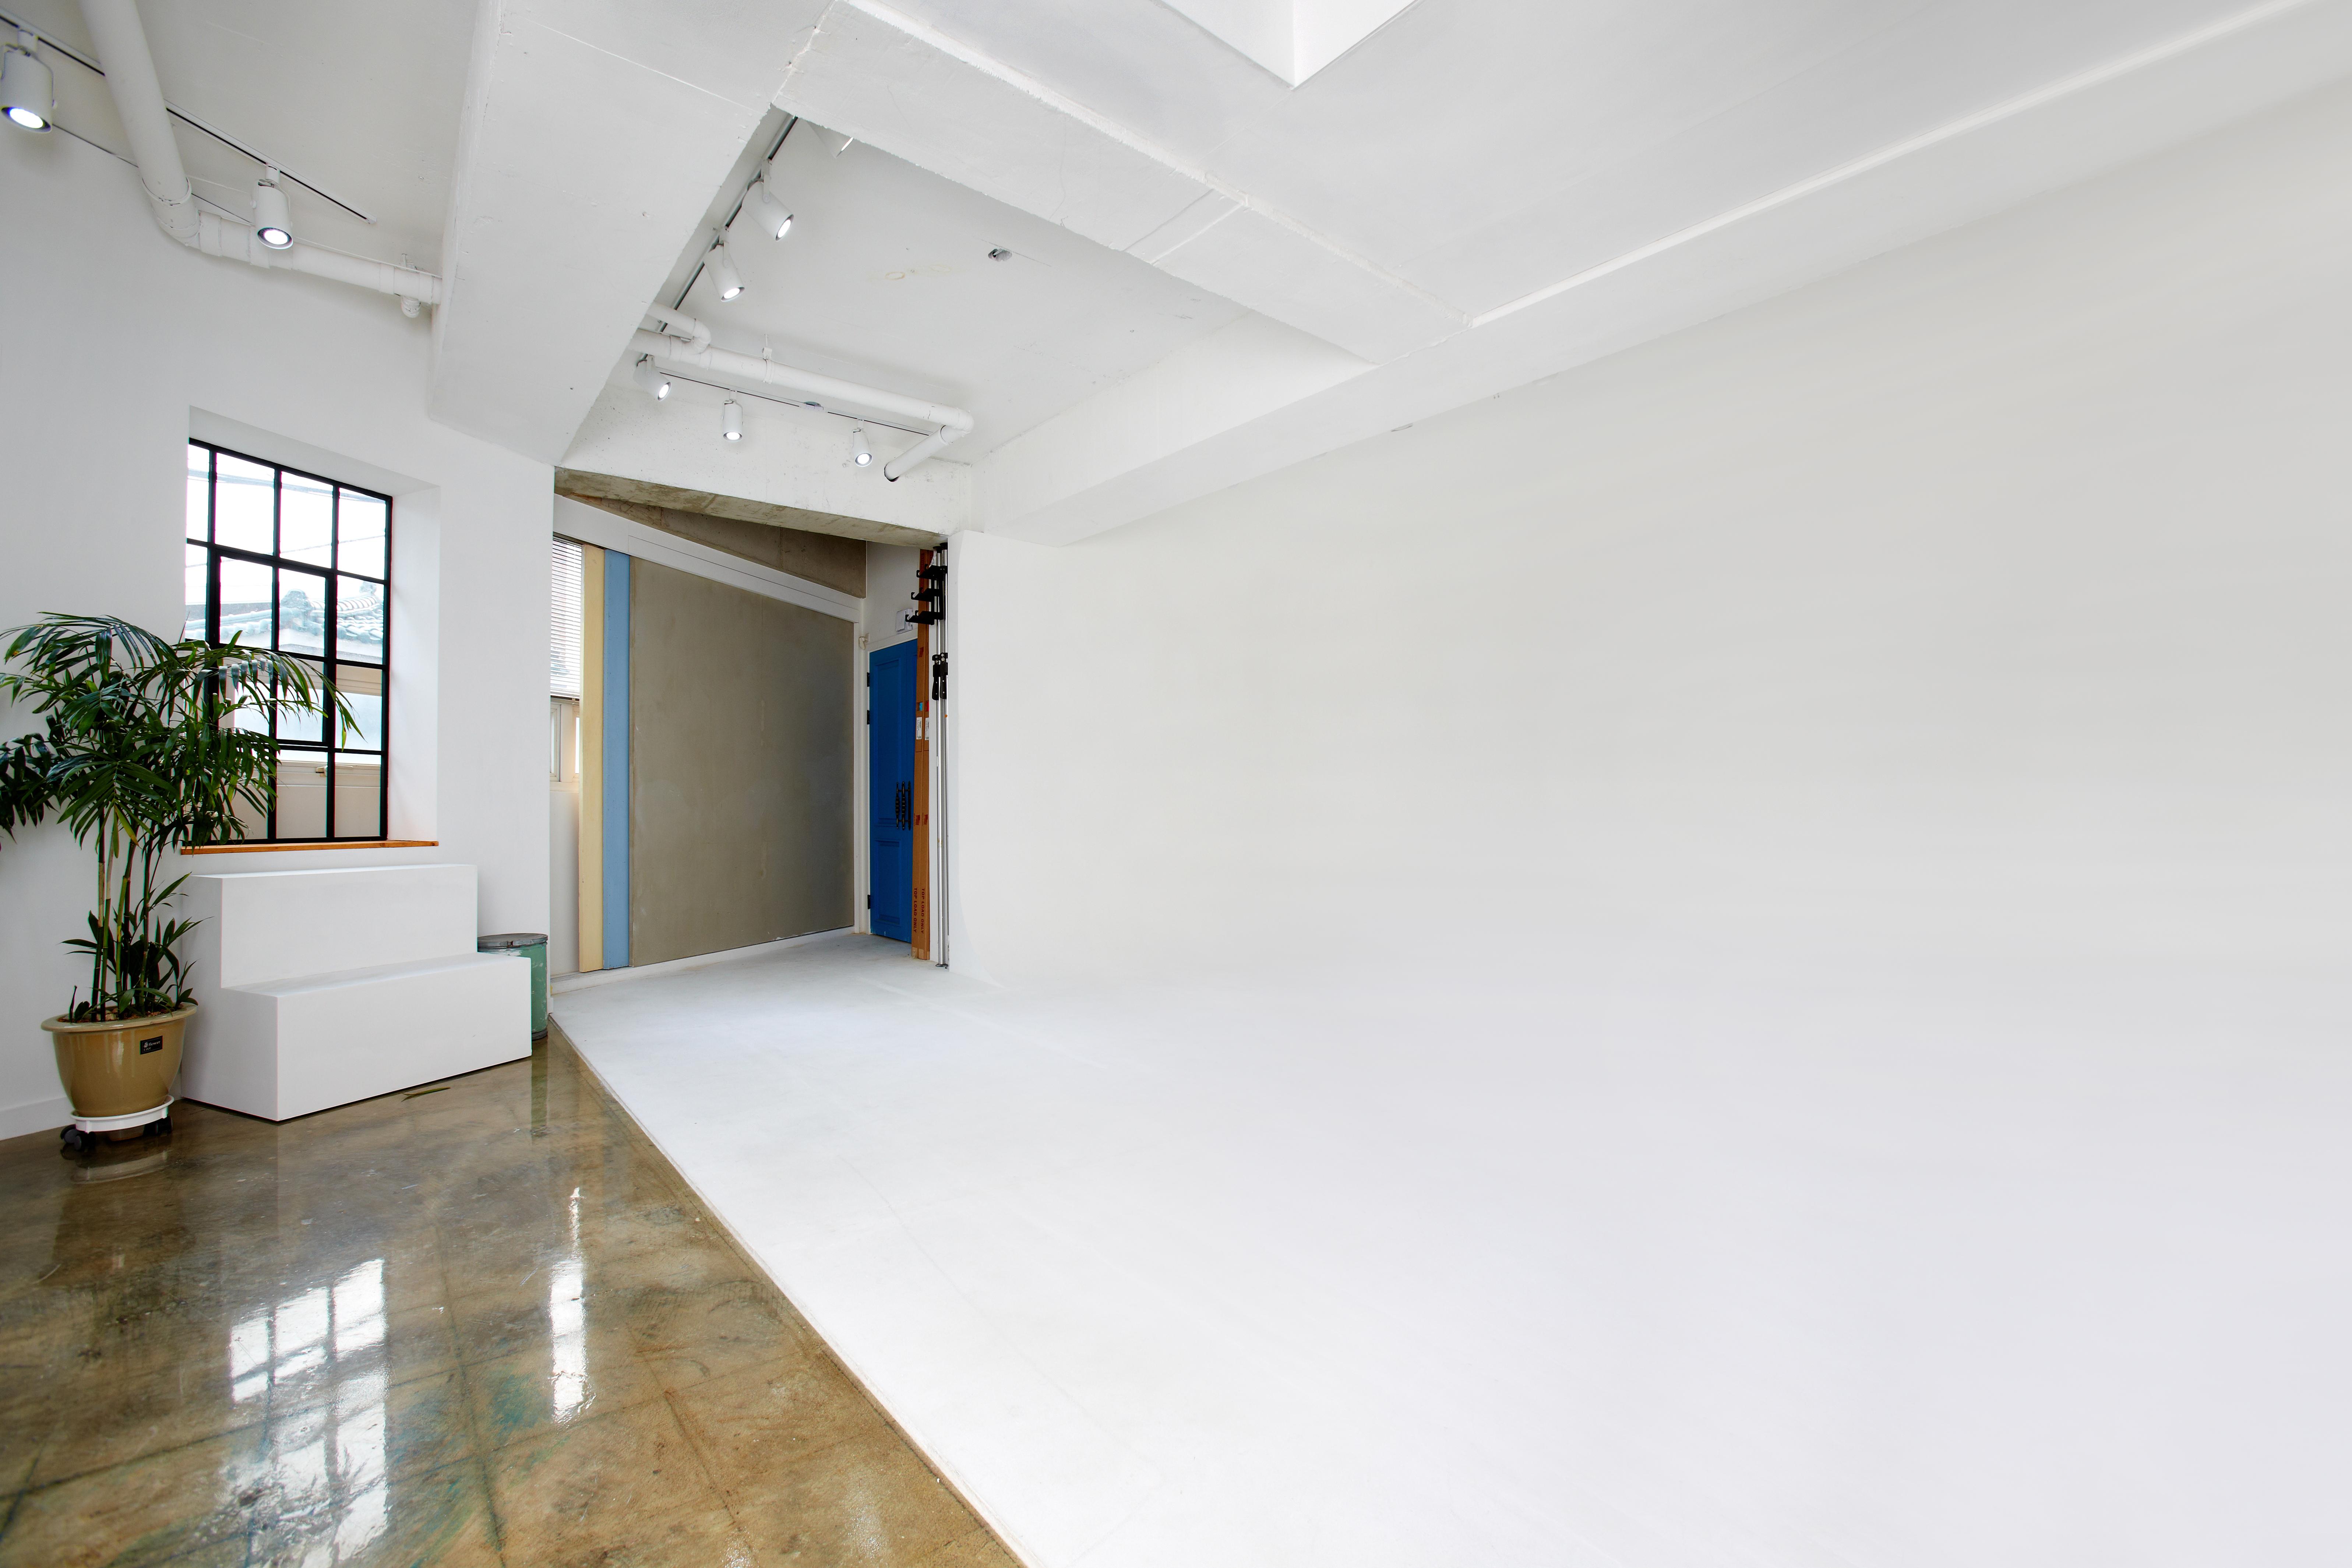 Room.C 186